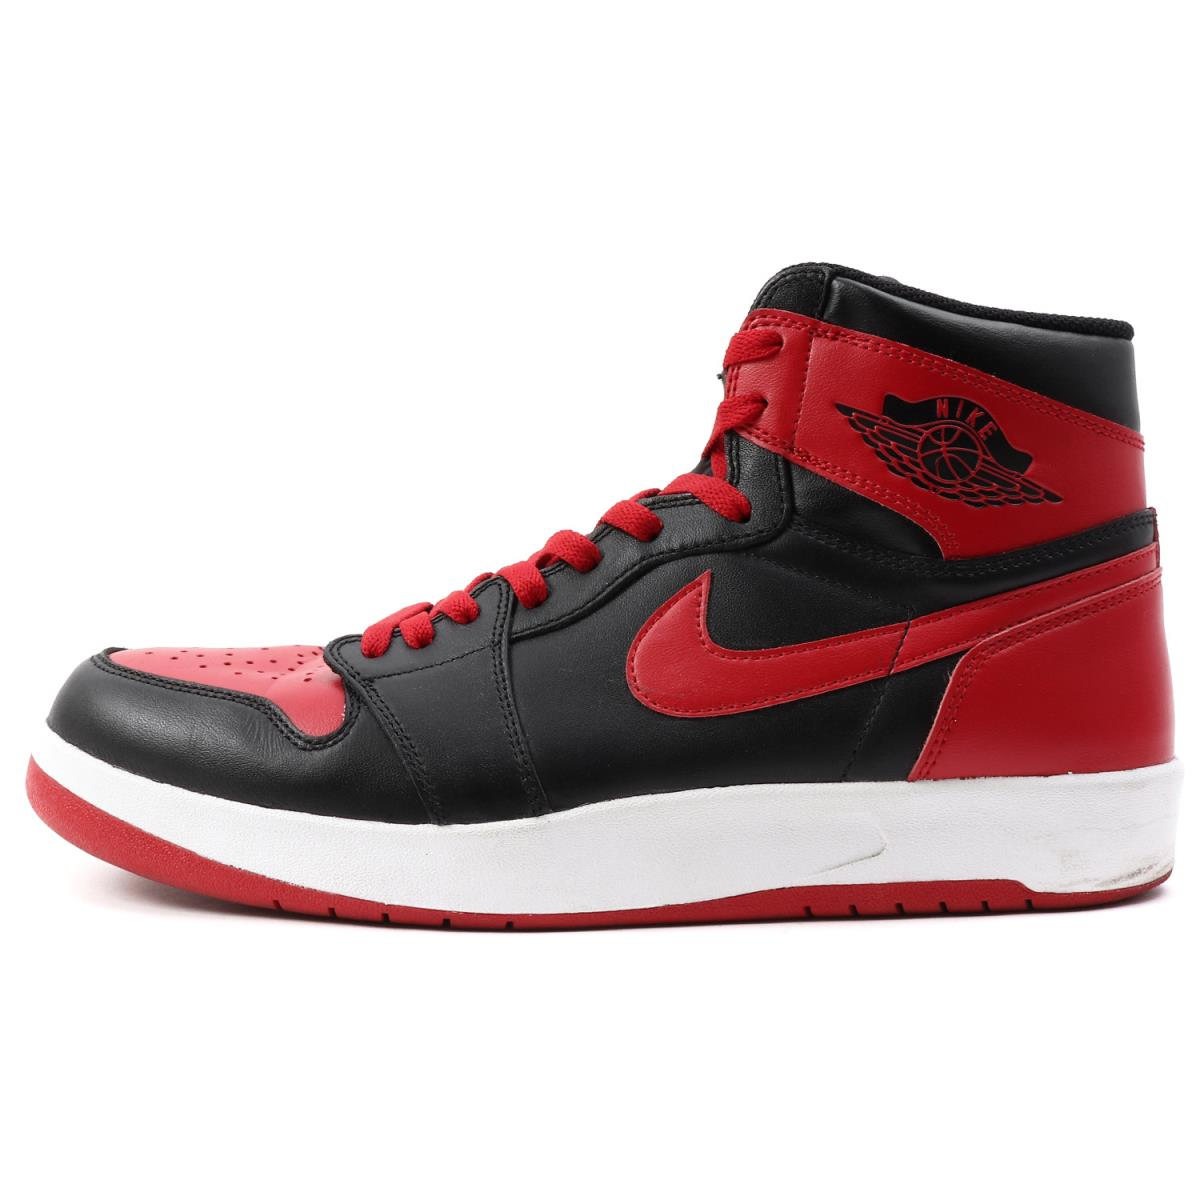 089e780f1e9d14 BEEGLE by Boo-Bee  NIKE (Nike) AIR JORDAN 1.5 RETRO HIGH THE RETURN ...